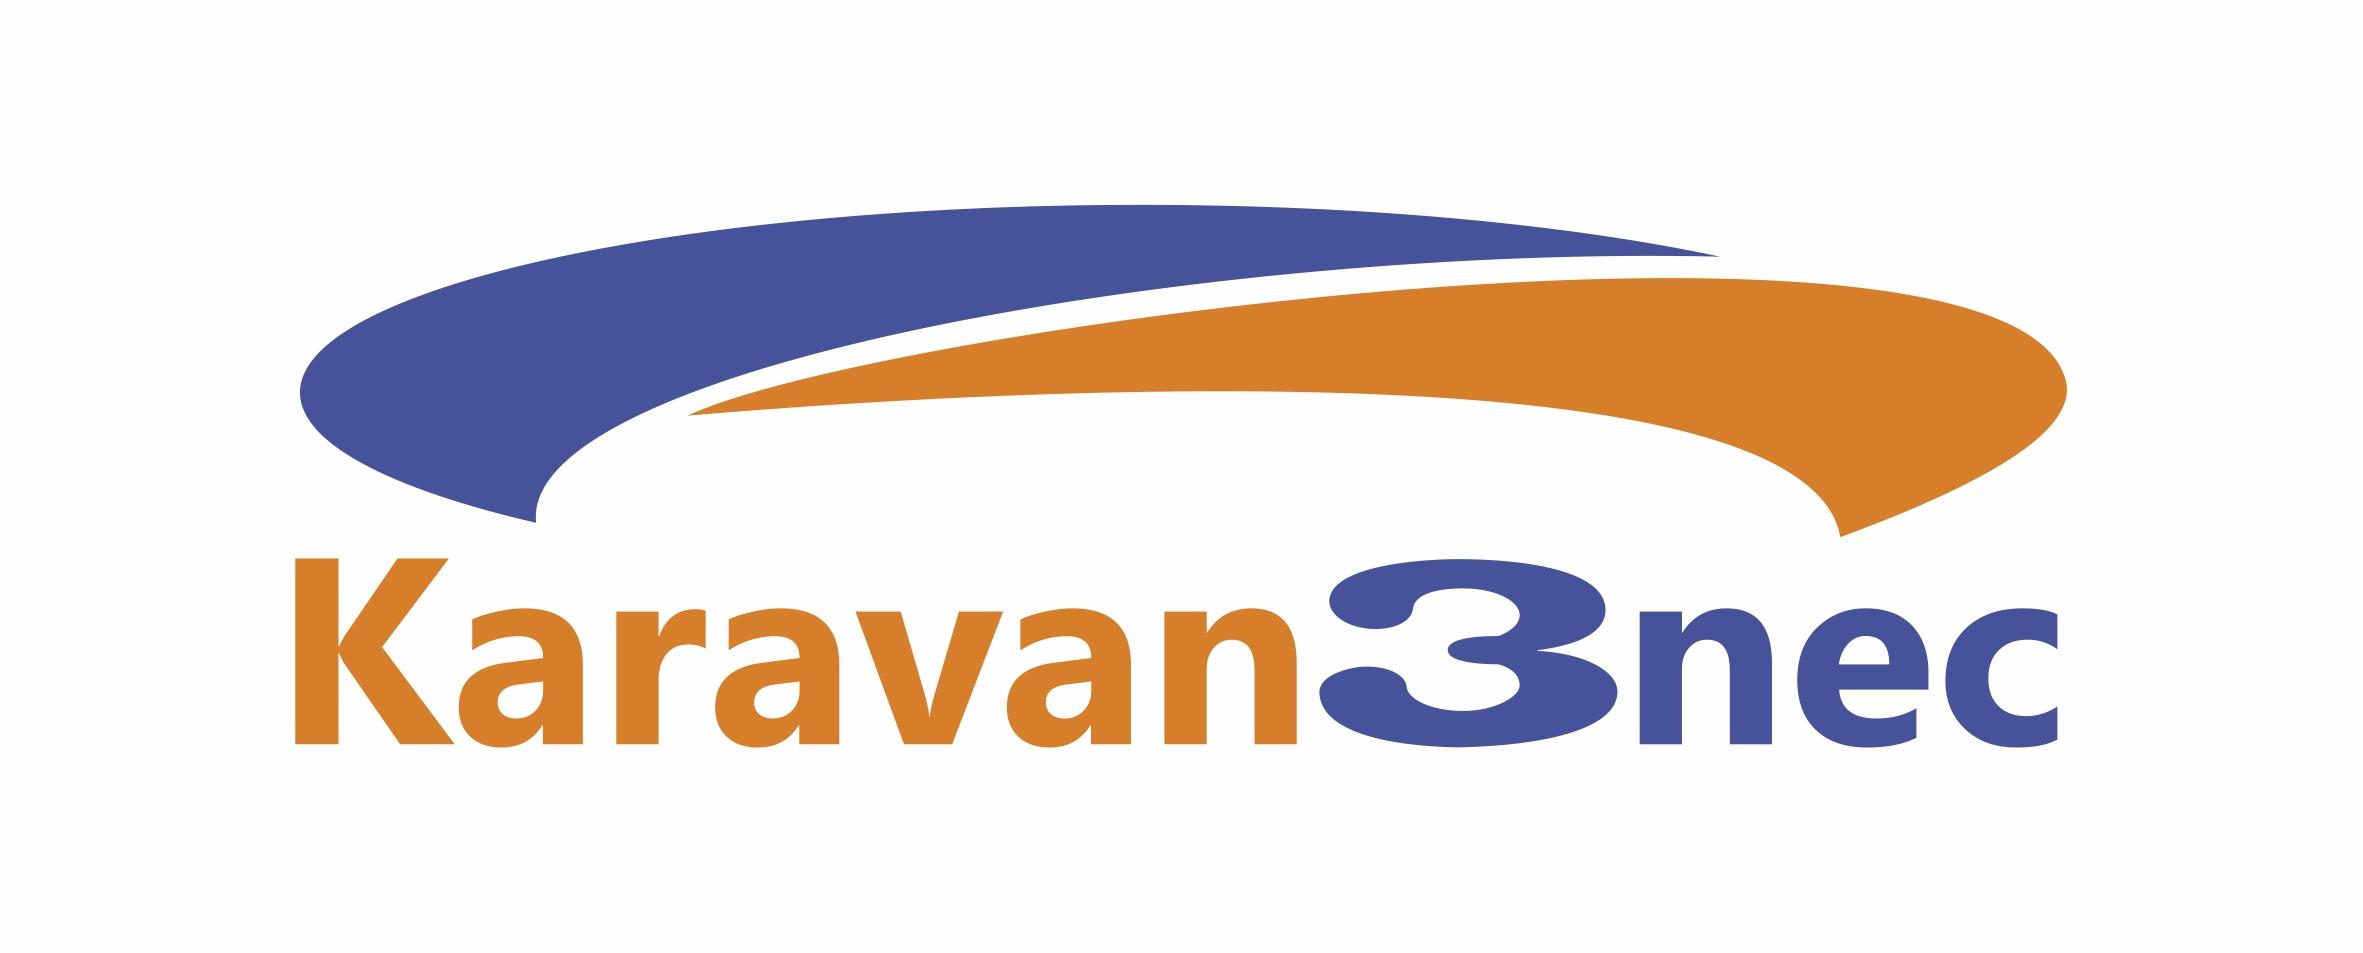 Karavan3nec